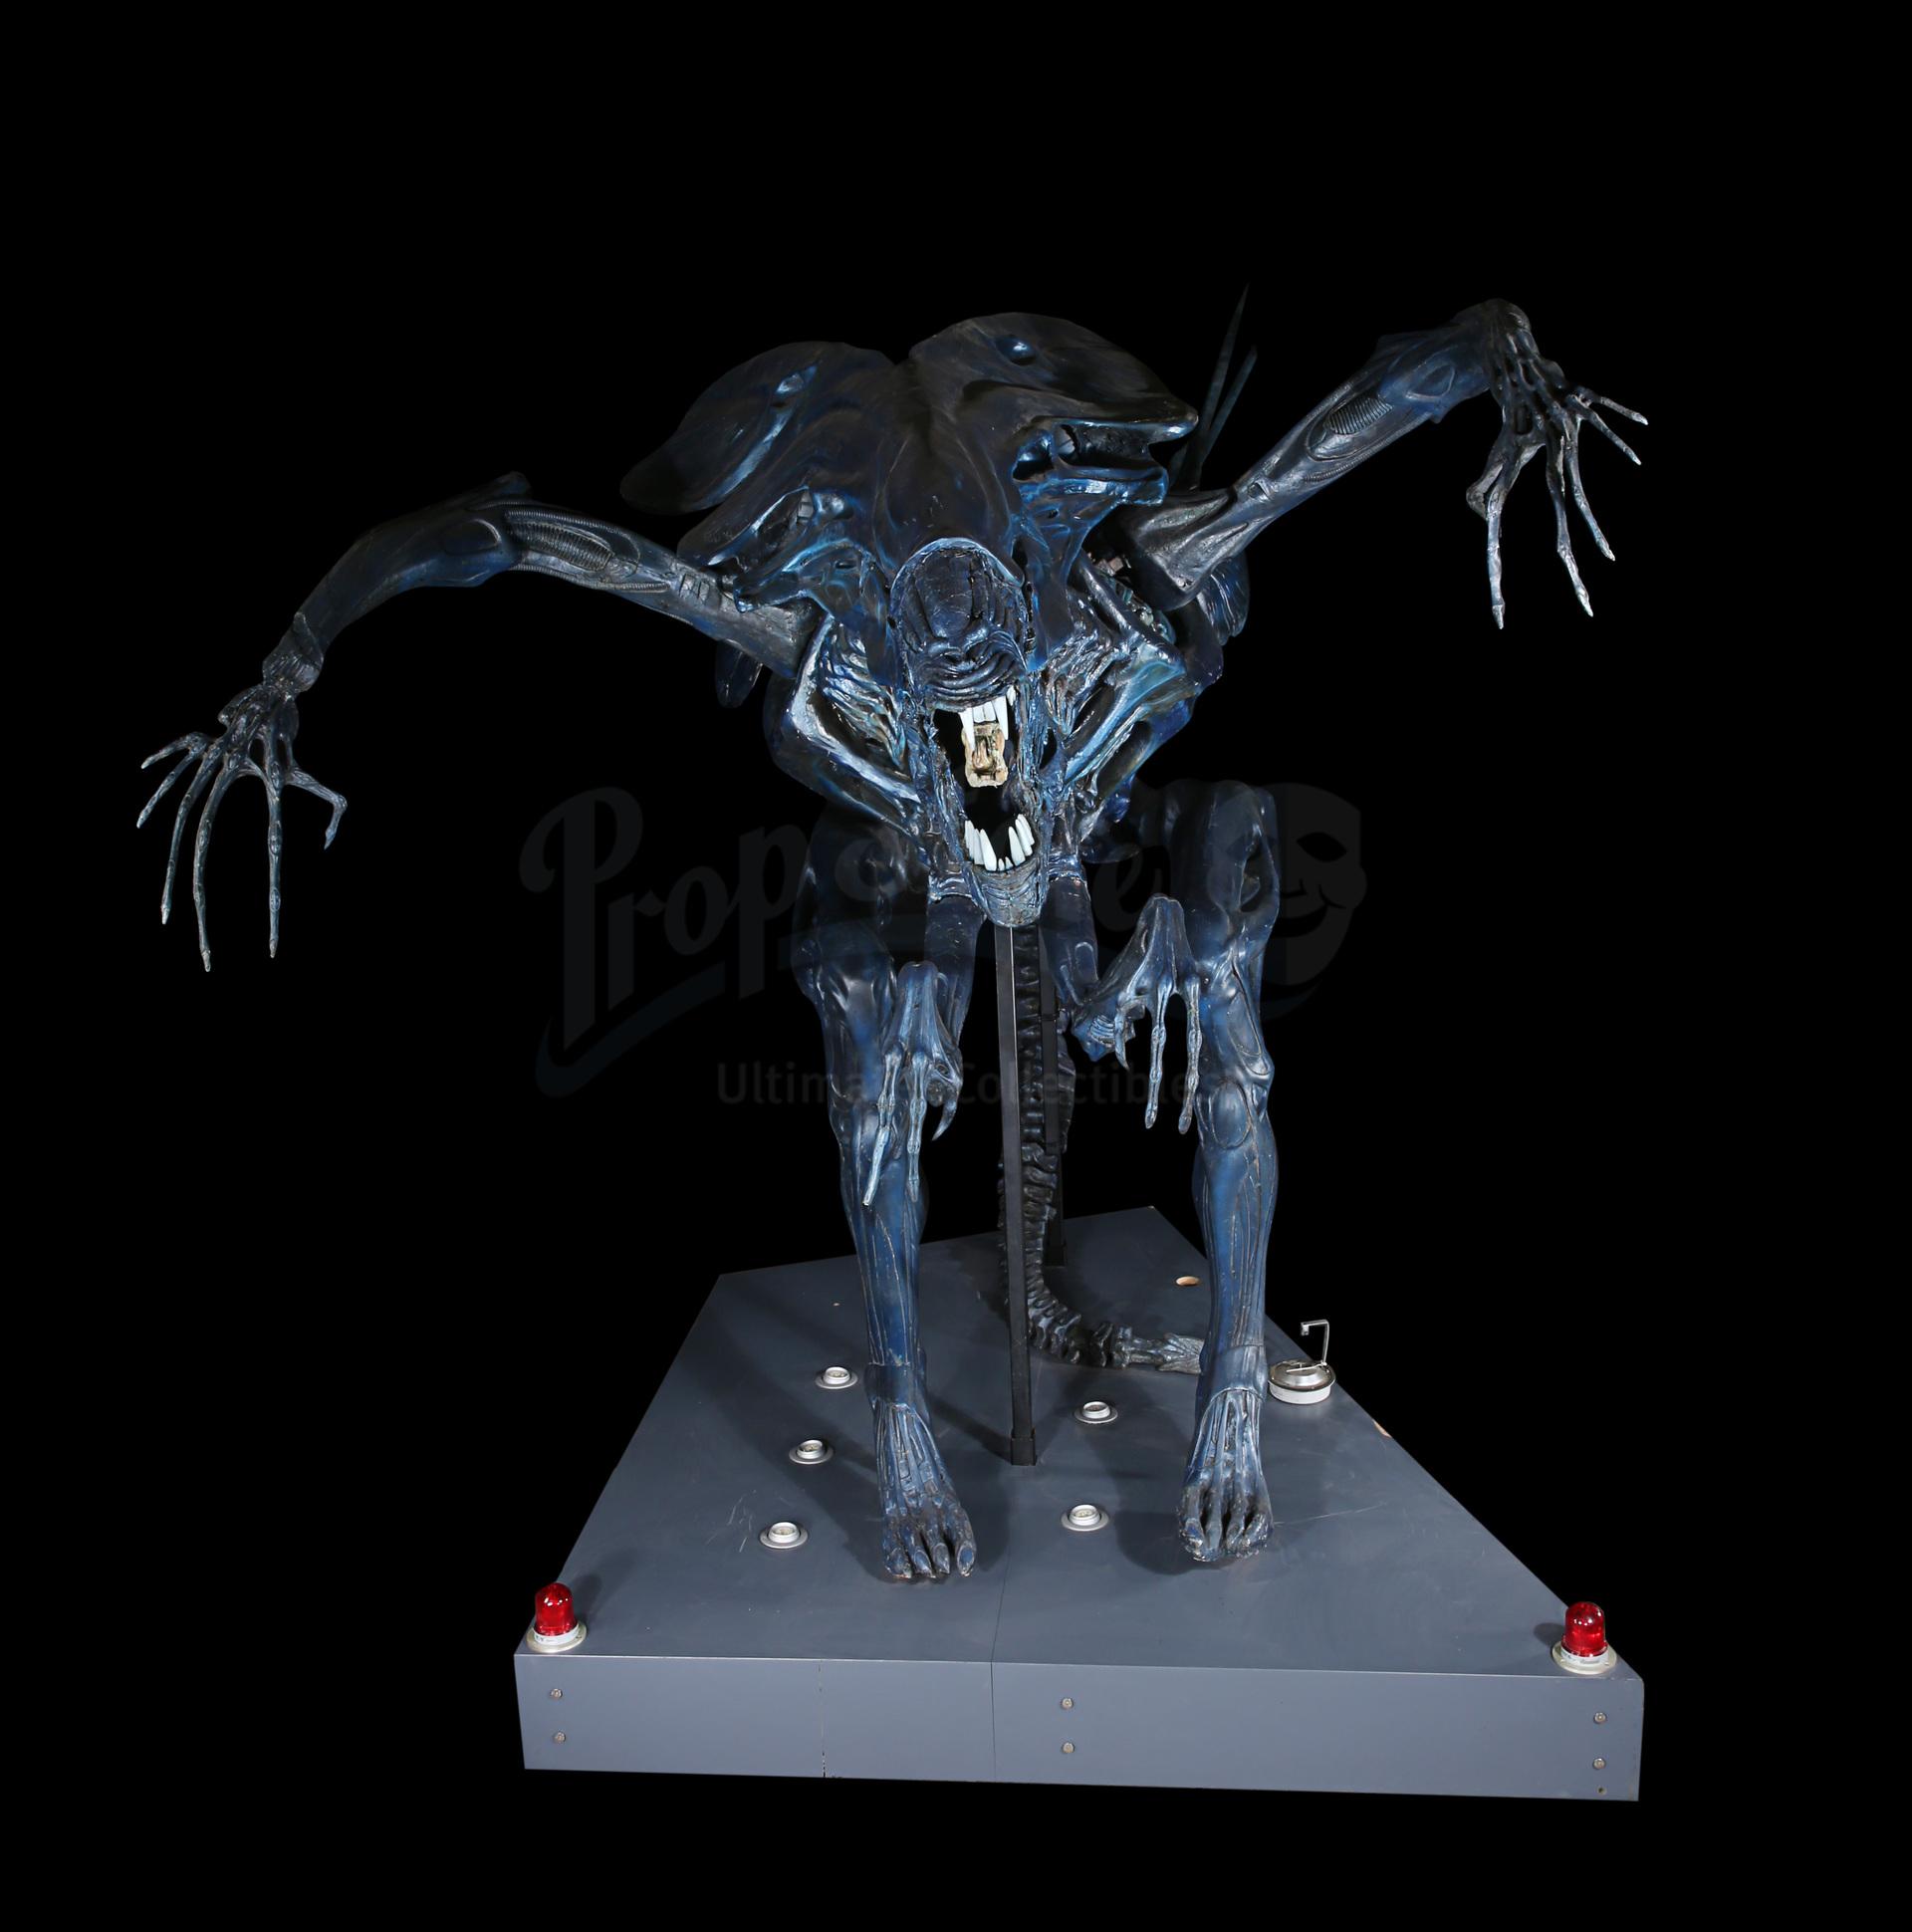 ALIENS (1986) - Full-size Promotional Alien Queen - Image 19 of 38